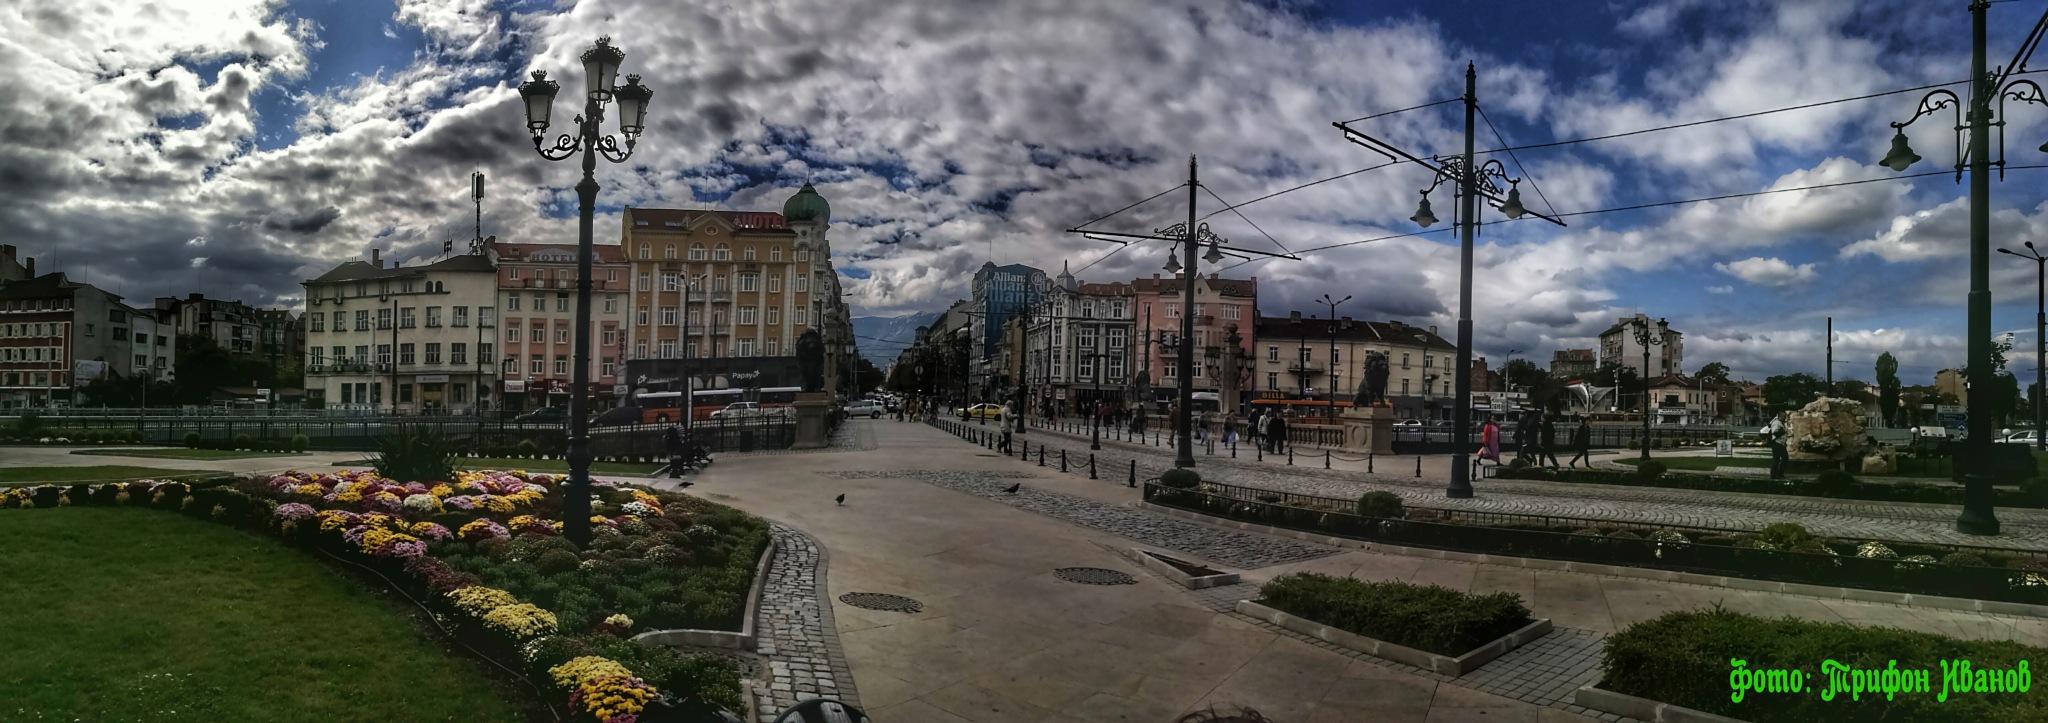 Bulgaria metropolis by Трифон Иванов